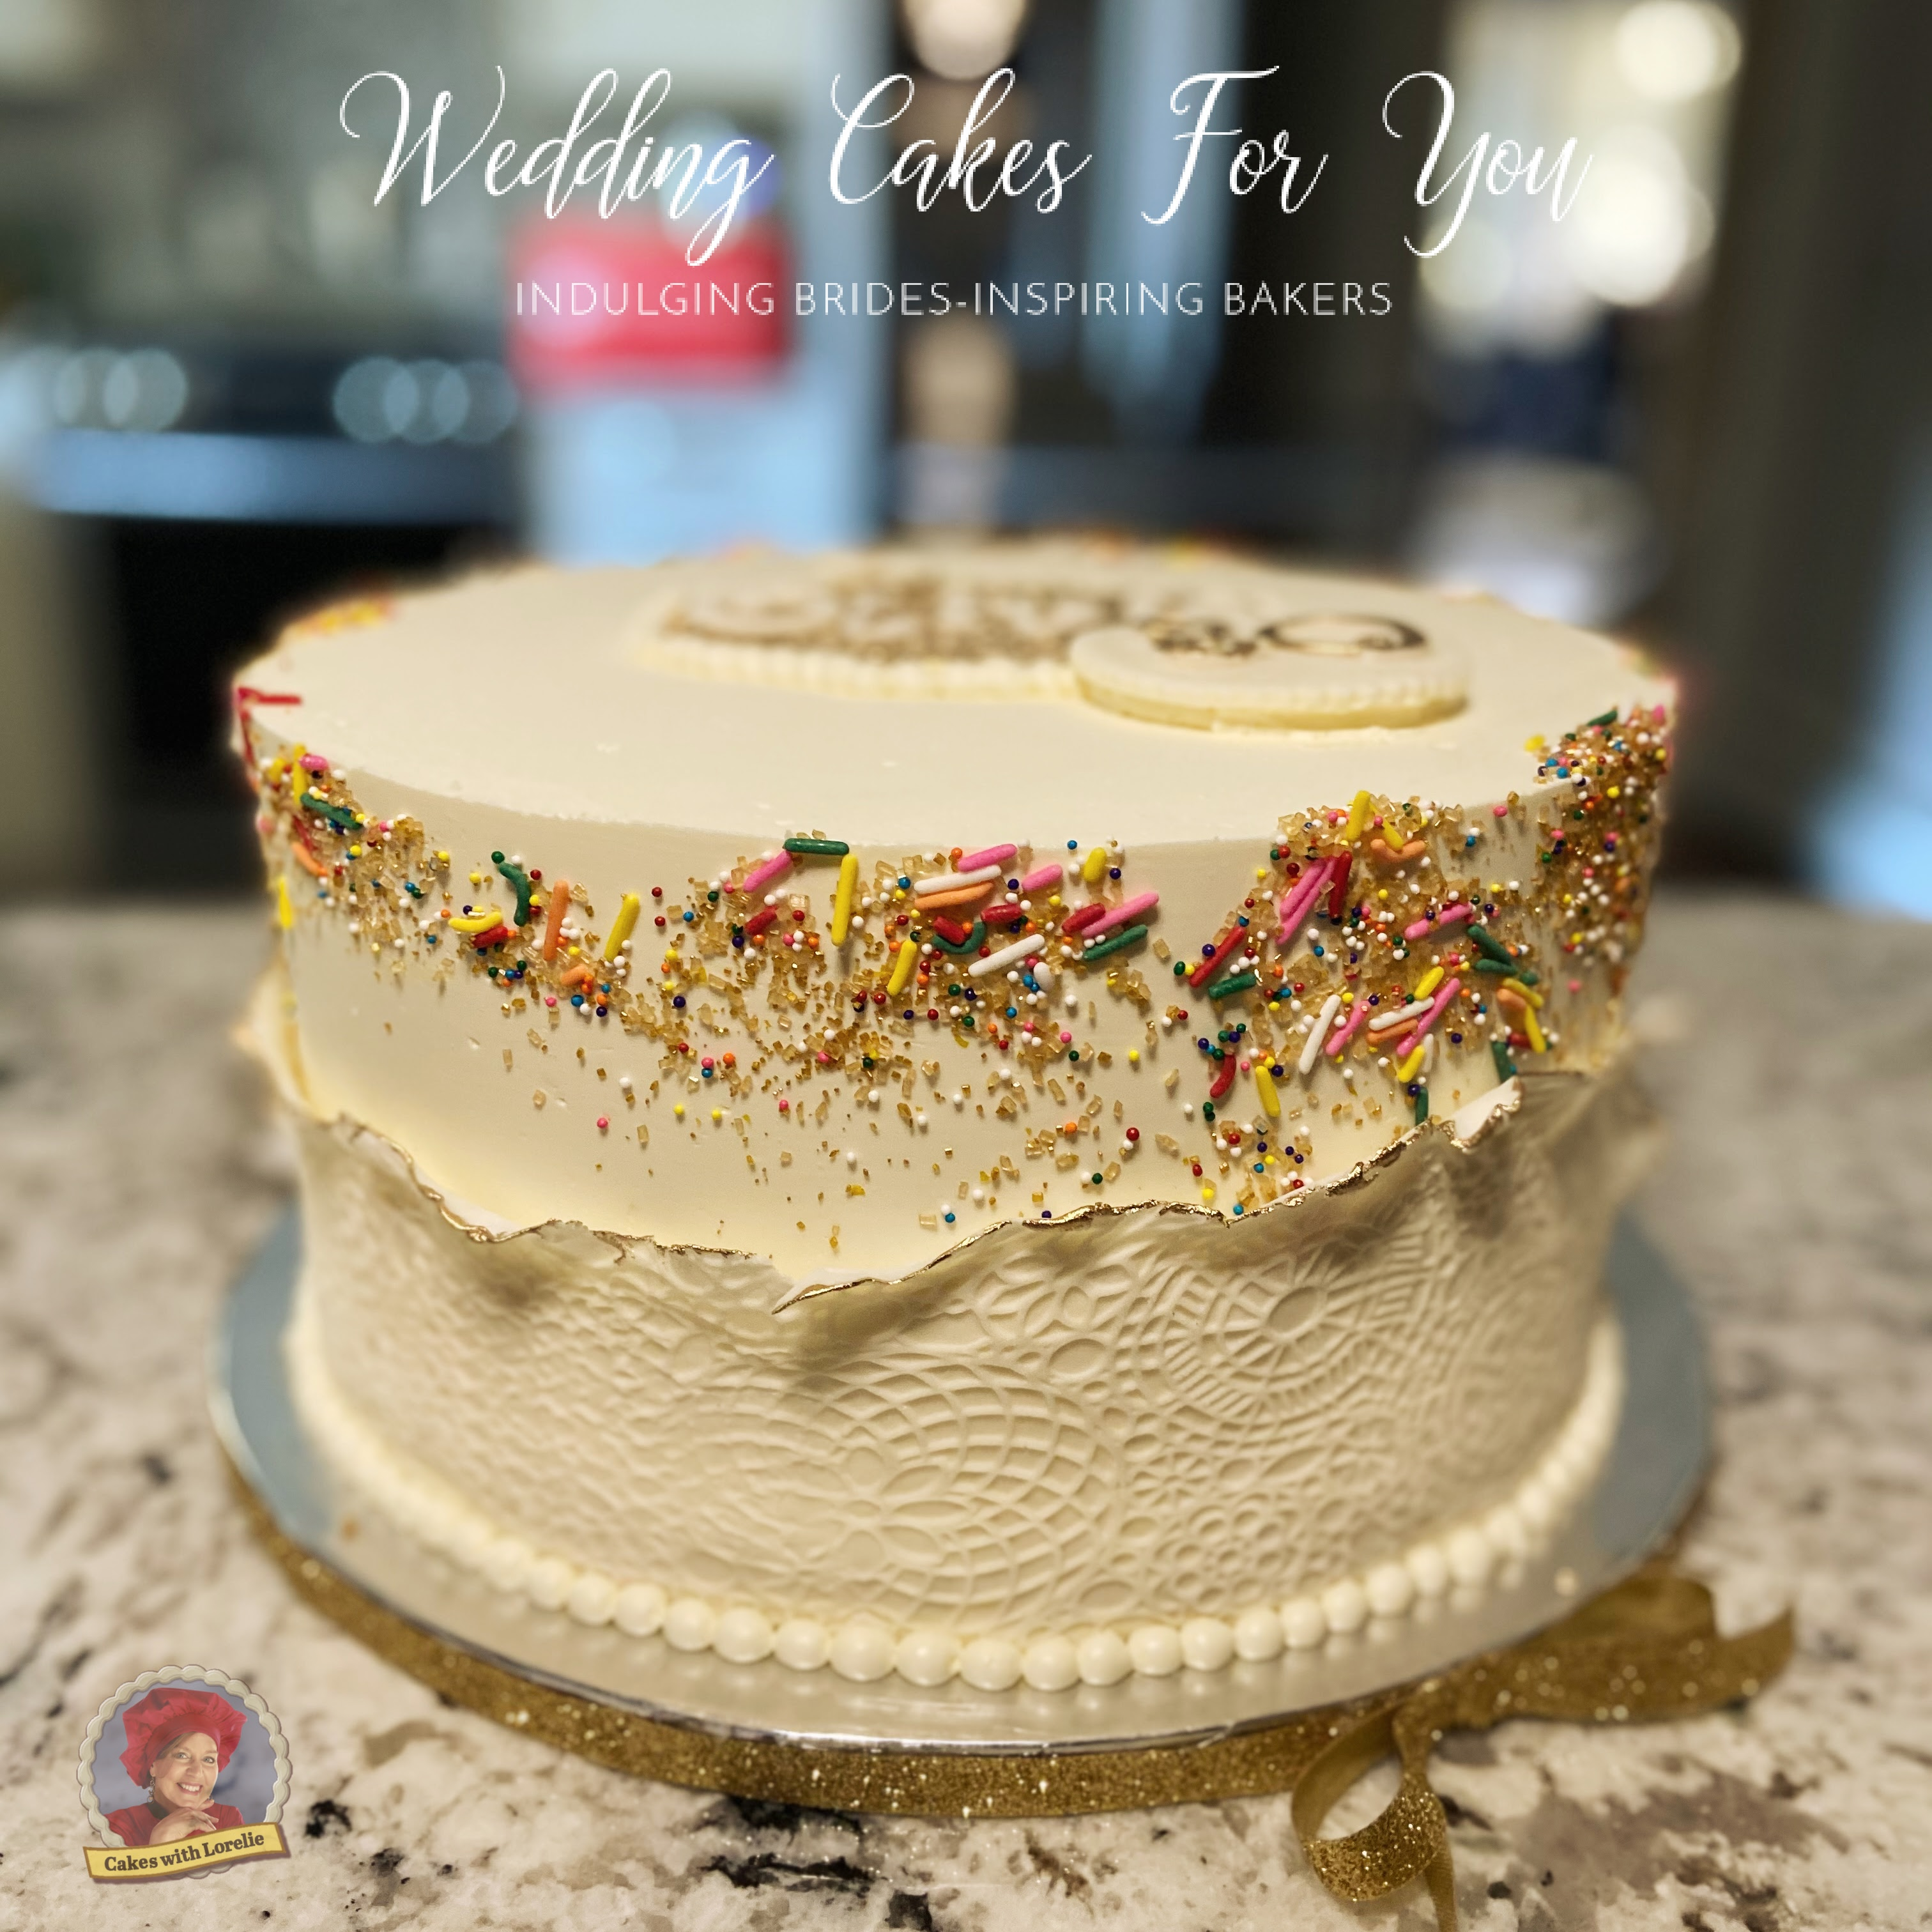 Fondant Cake Decorating And Cake Expert Guidance